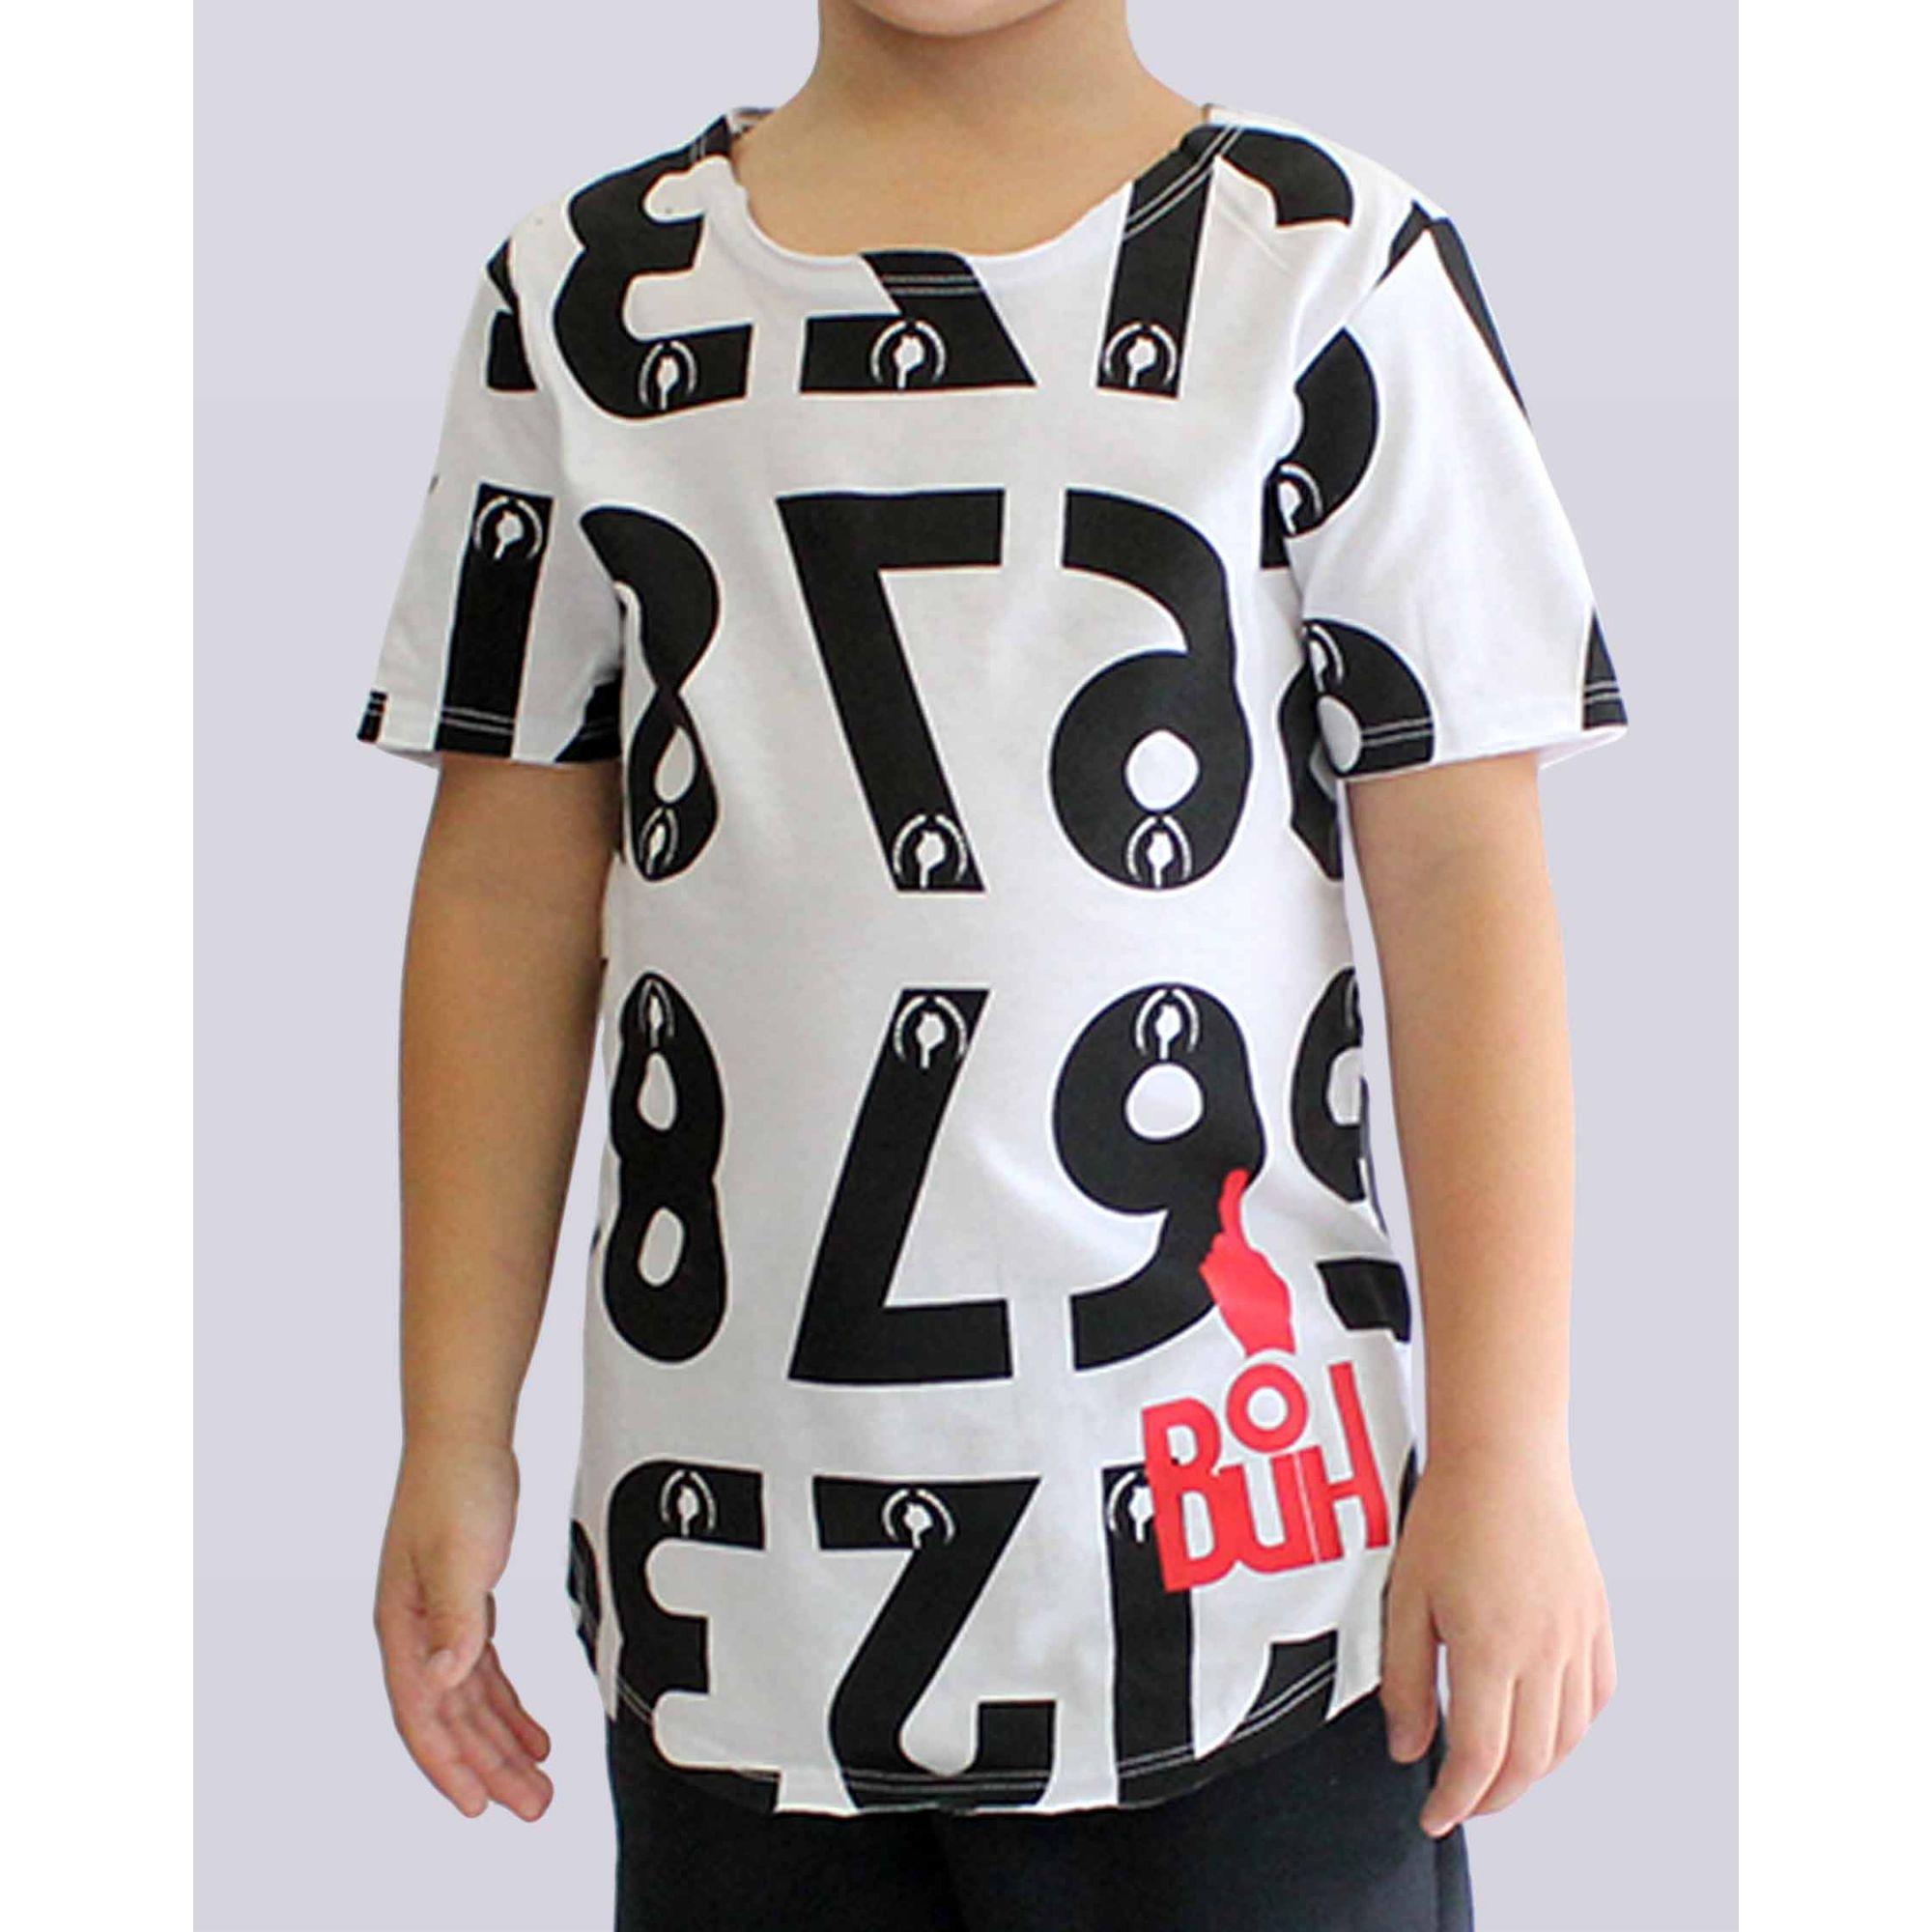 Camiseta Buh Numbers White & Black Kids